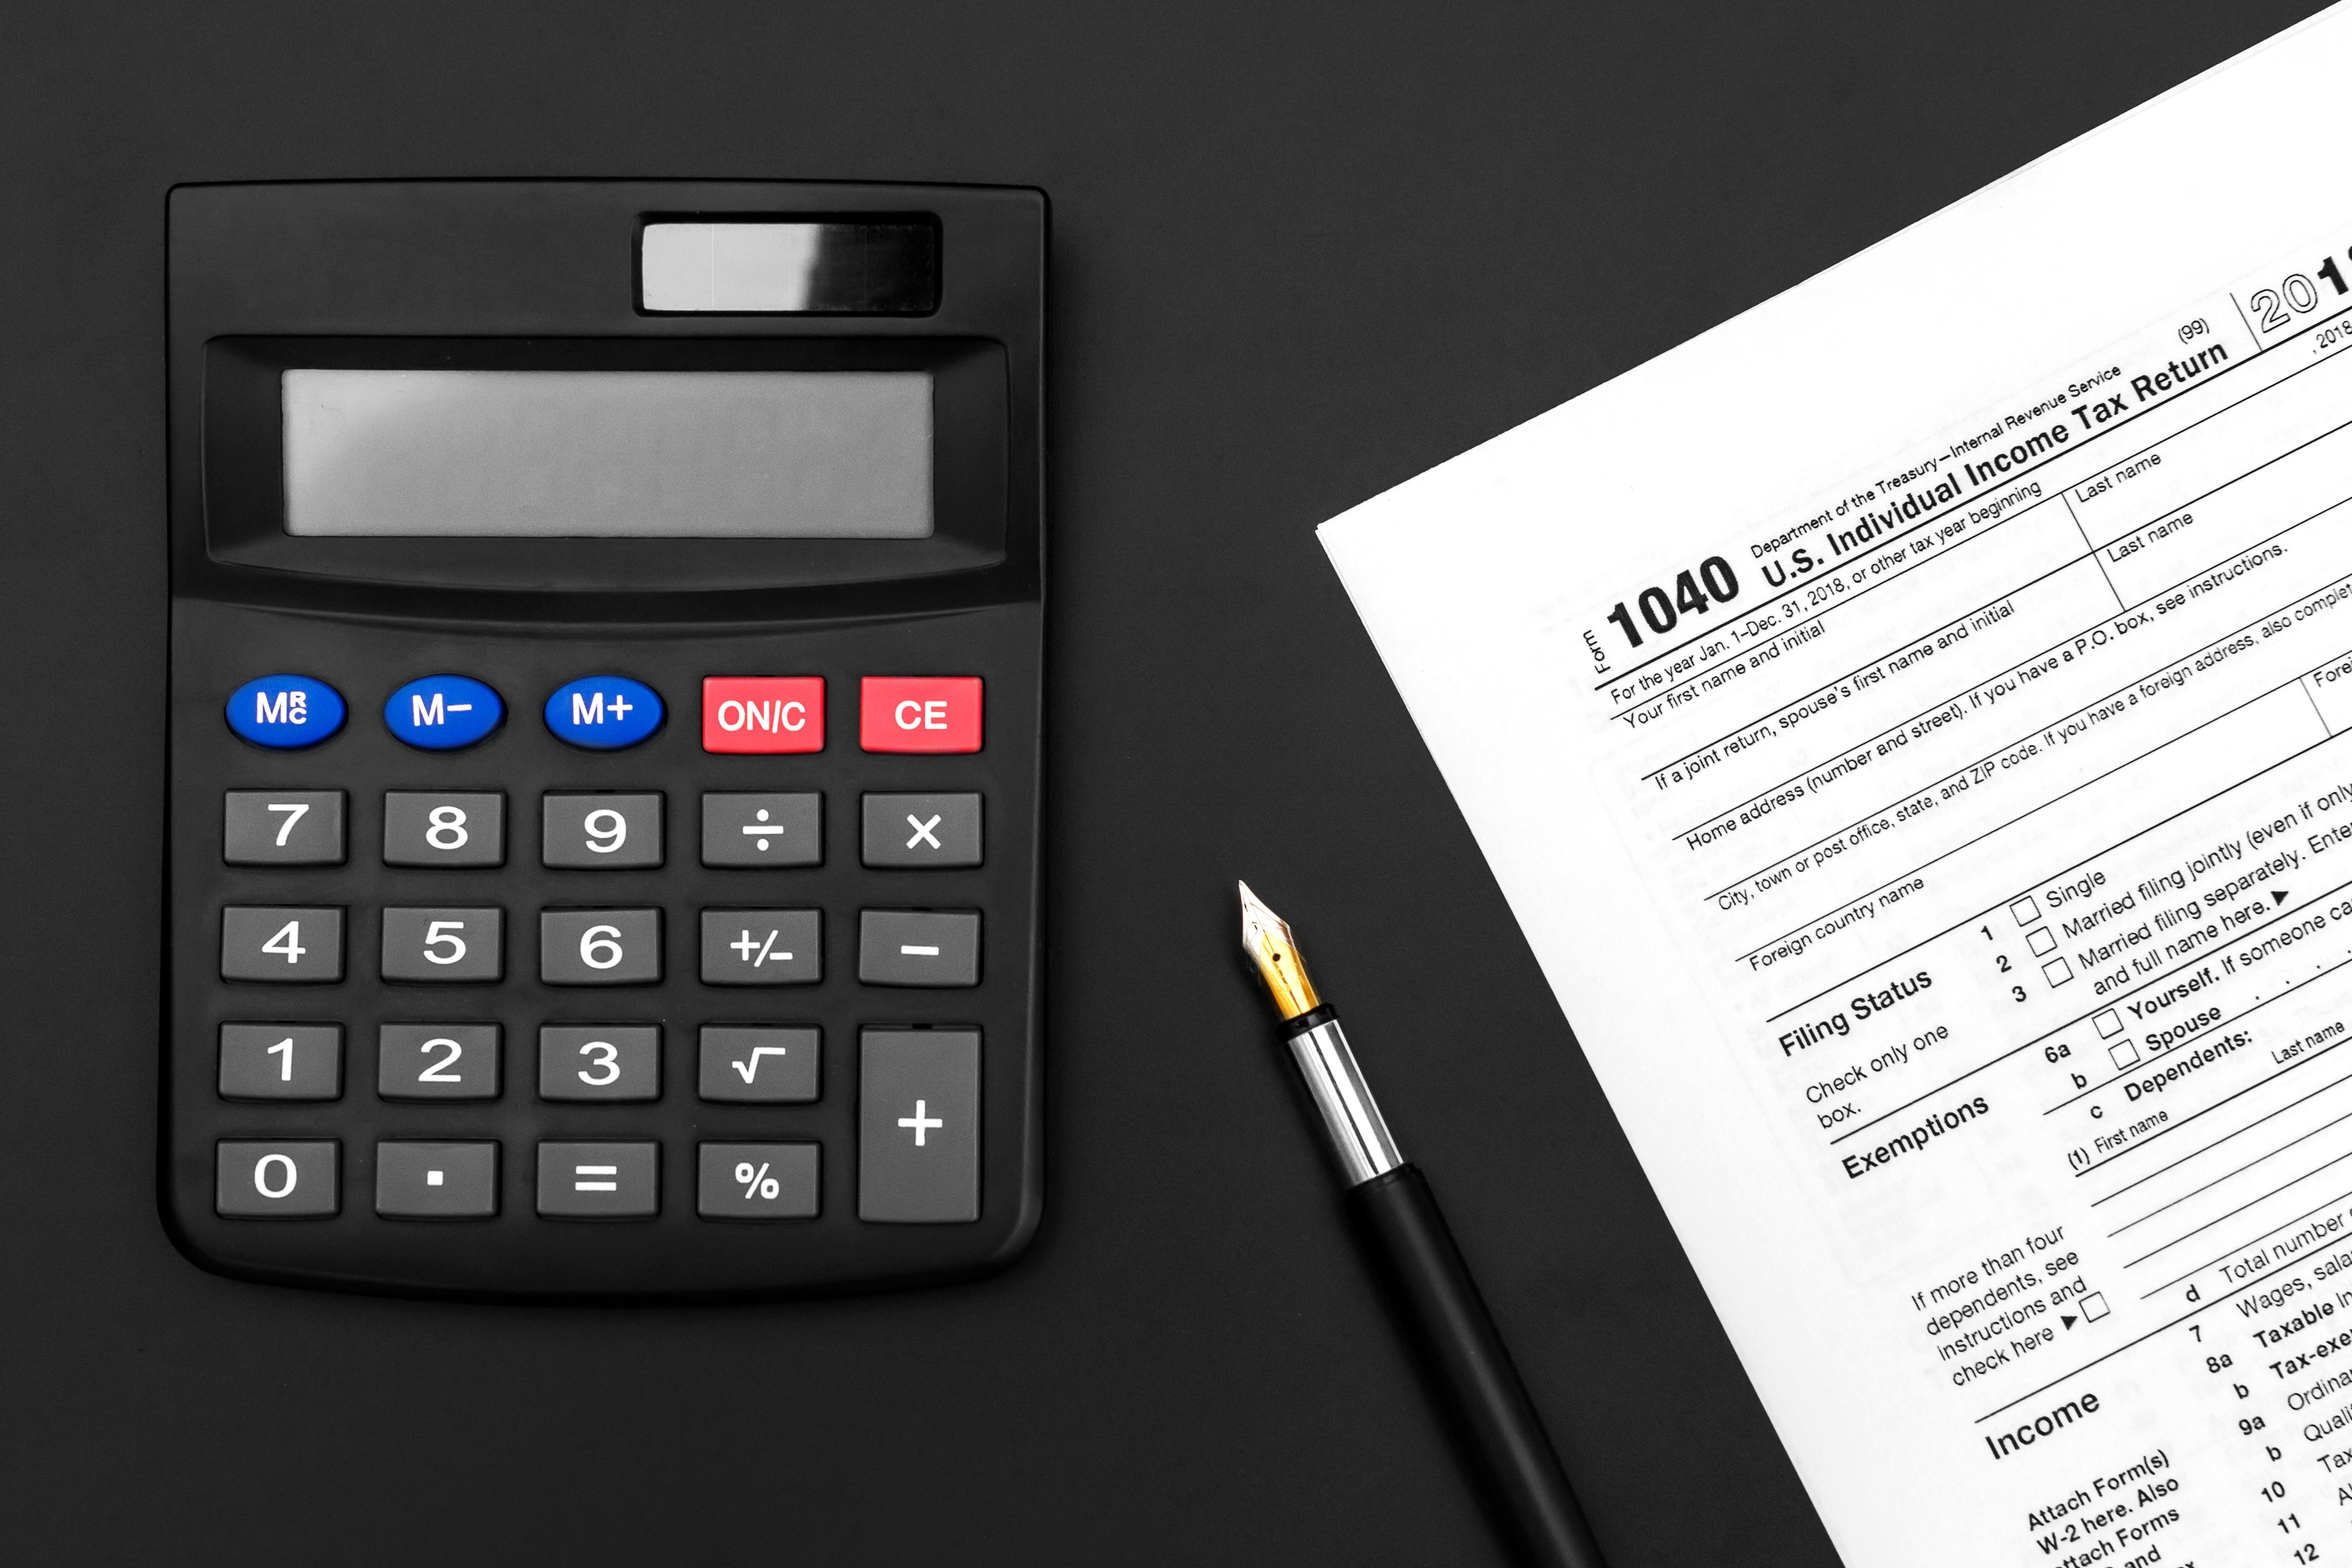 h&r block calculator 2020